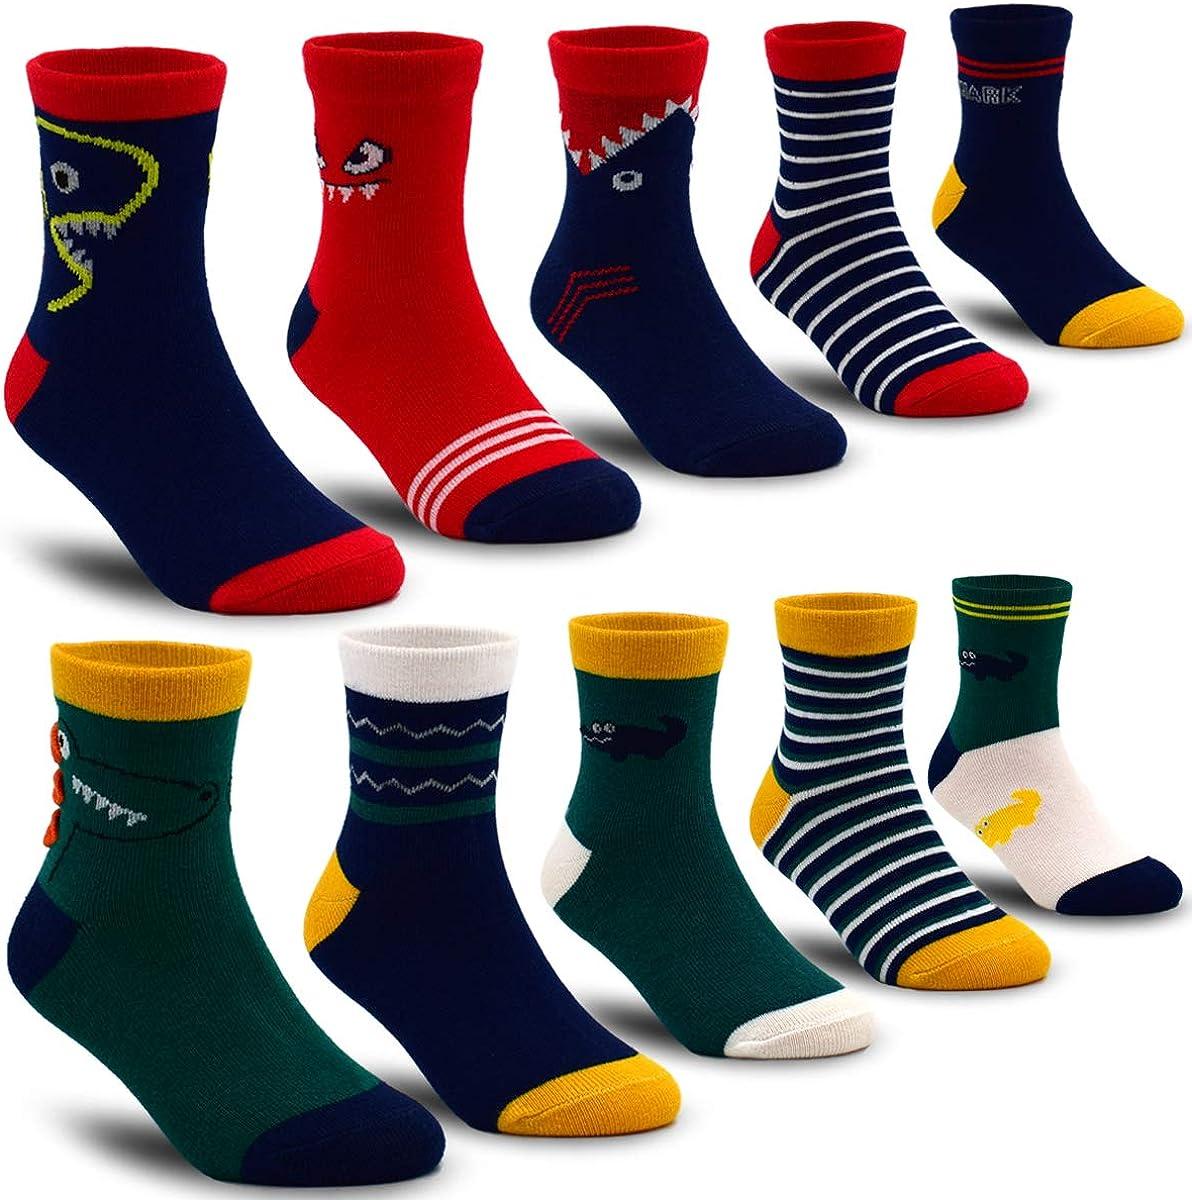 Boys' 10-Pack Cotton Crew Sock Kids Fashion Athletic Socks